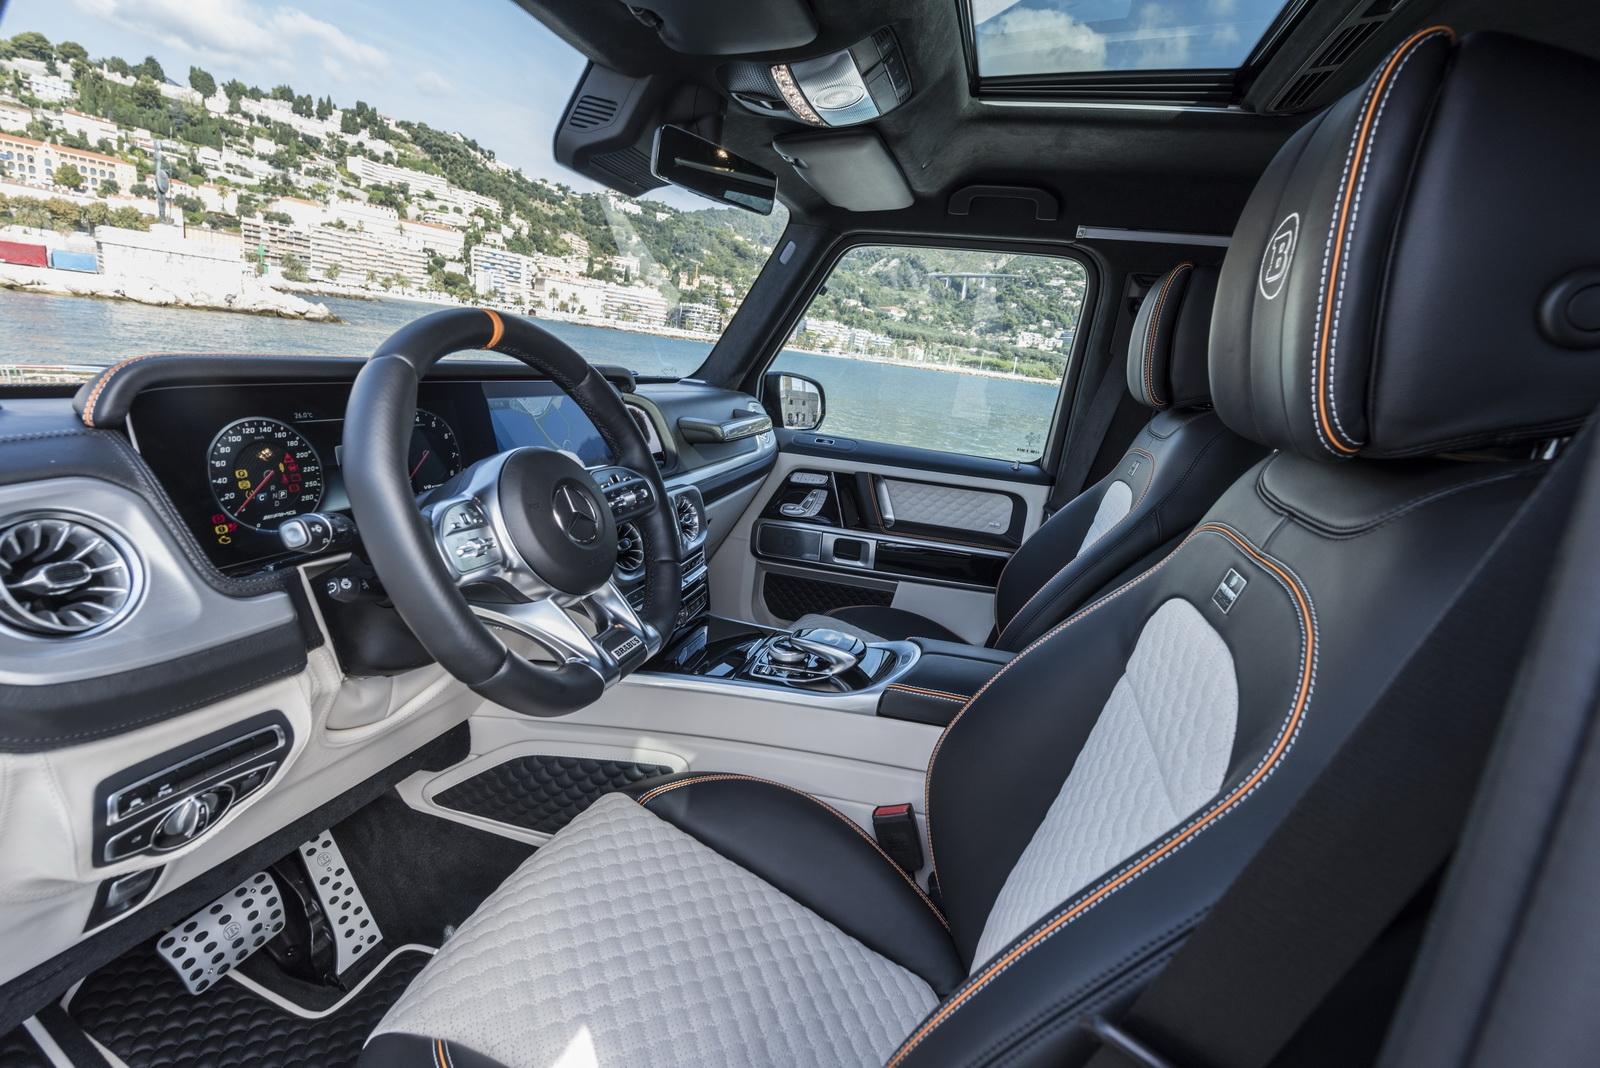 Brabus Mercedes-Benz Klasy G W463A